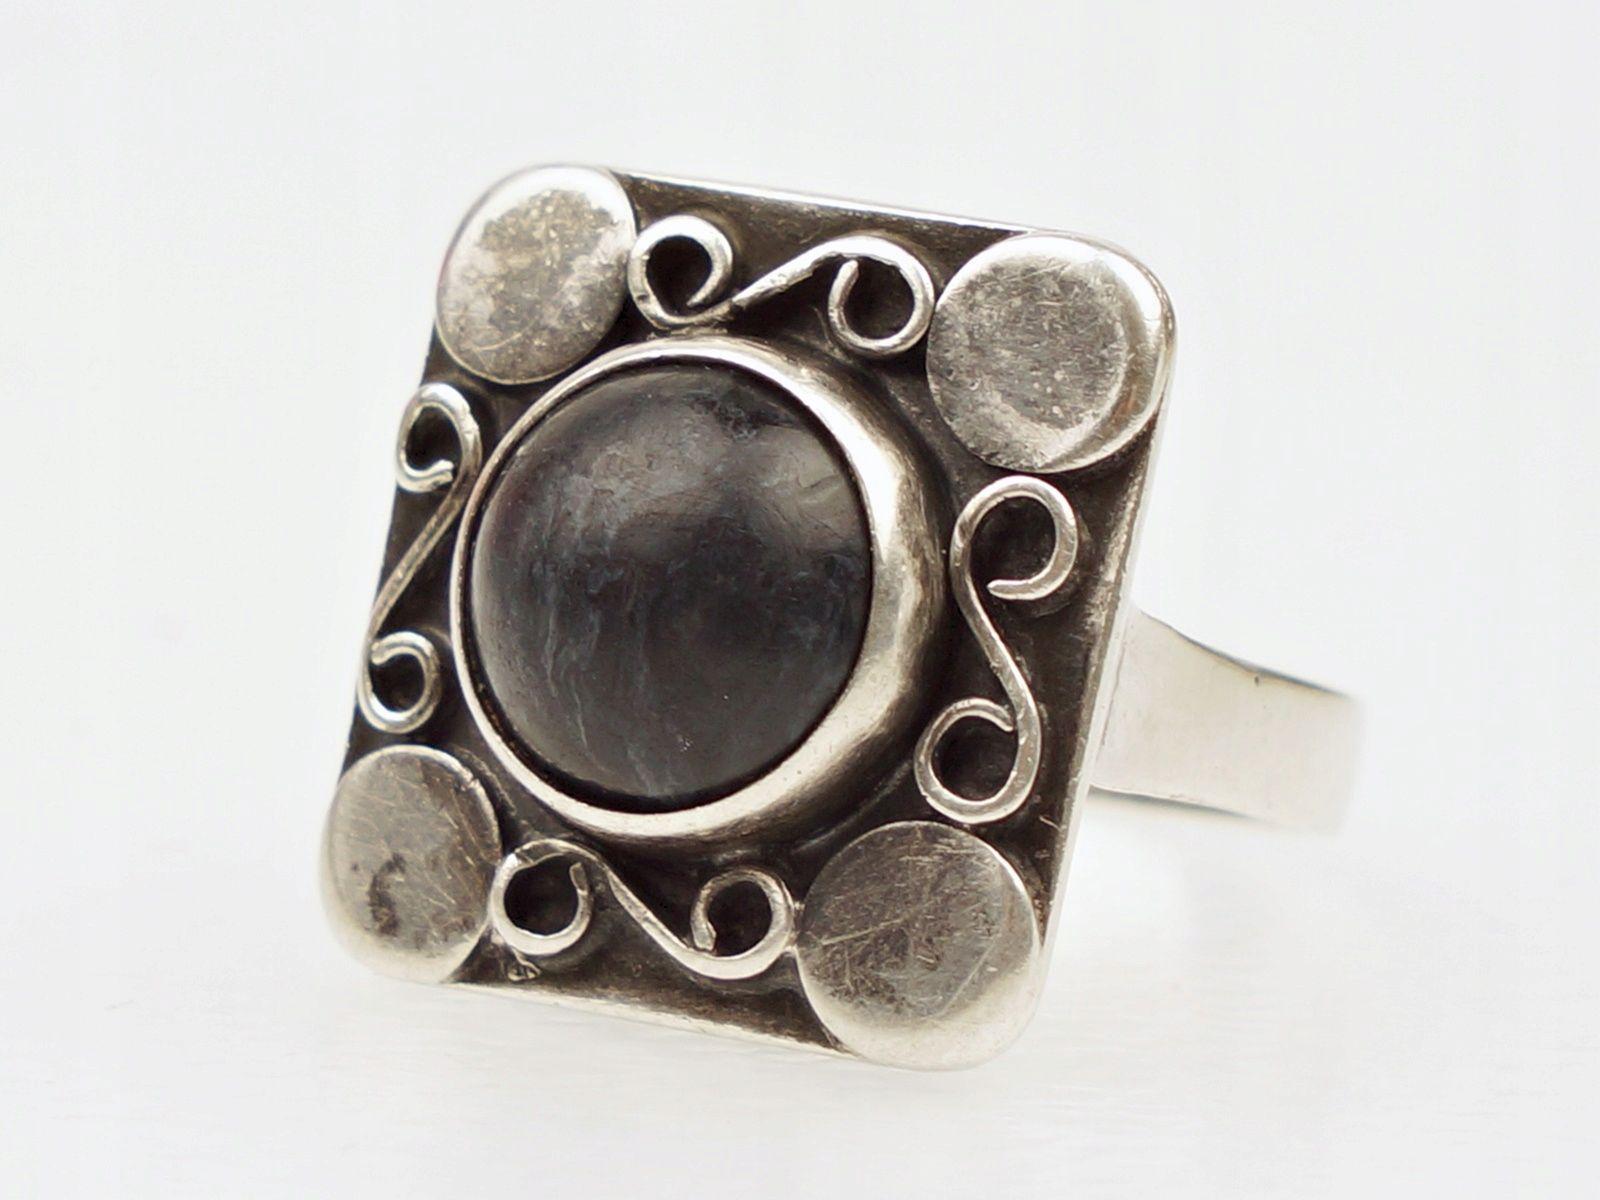 Pierscionek Rytosztuka Poznan Sodalit 8093399462 Oficjalne Archiwum Allegro Ringe Rings Metal Working